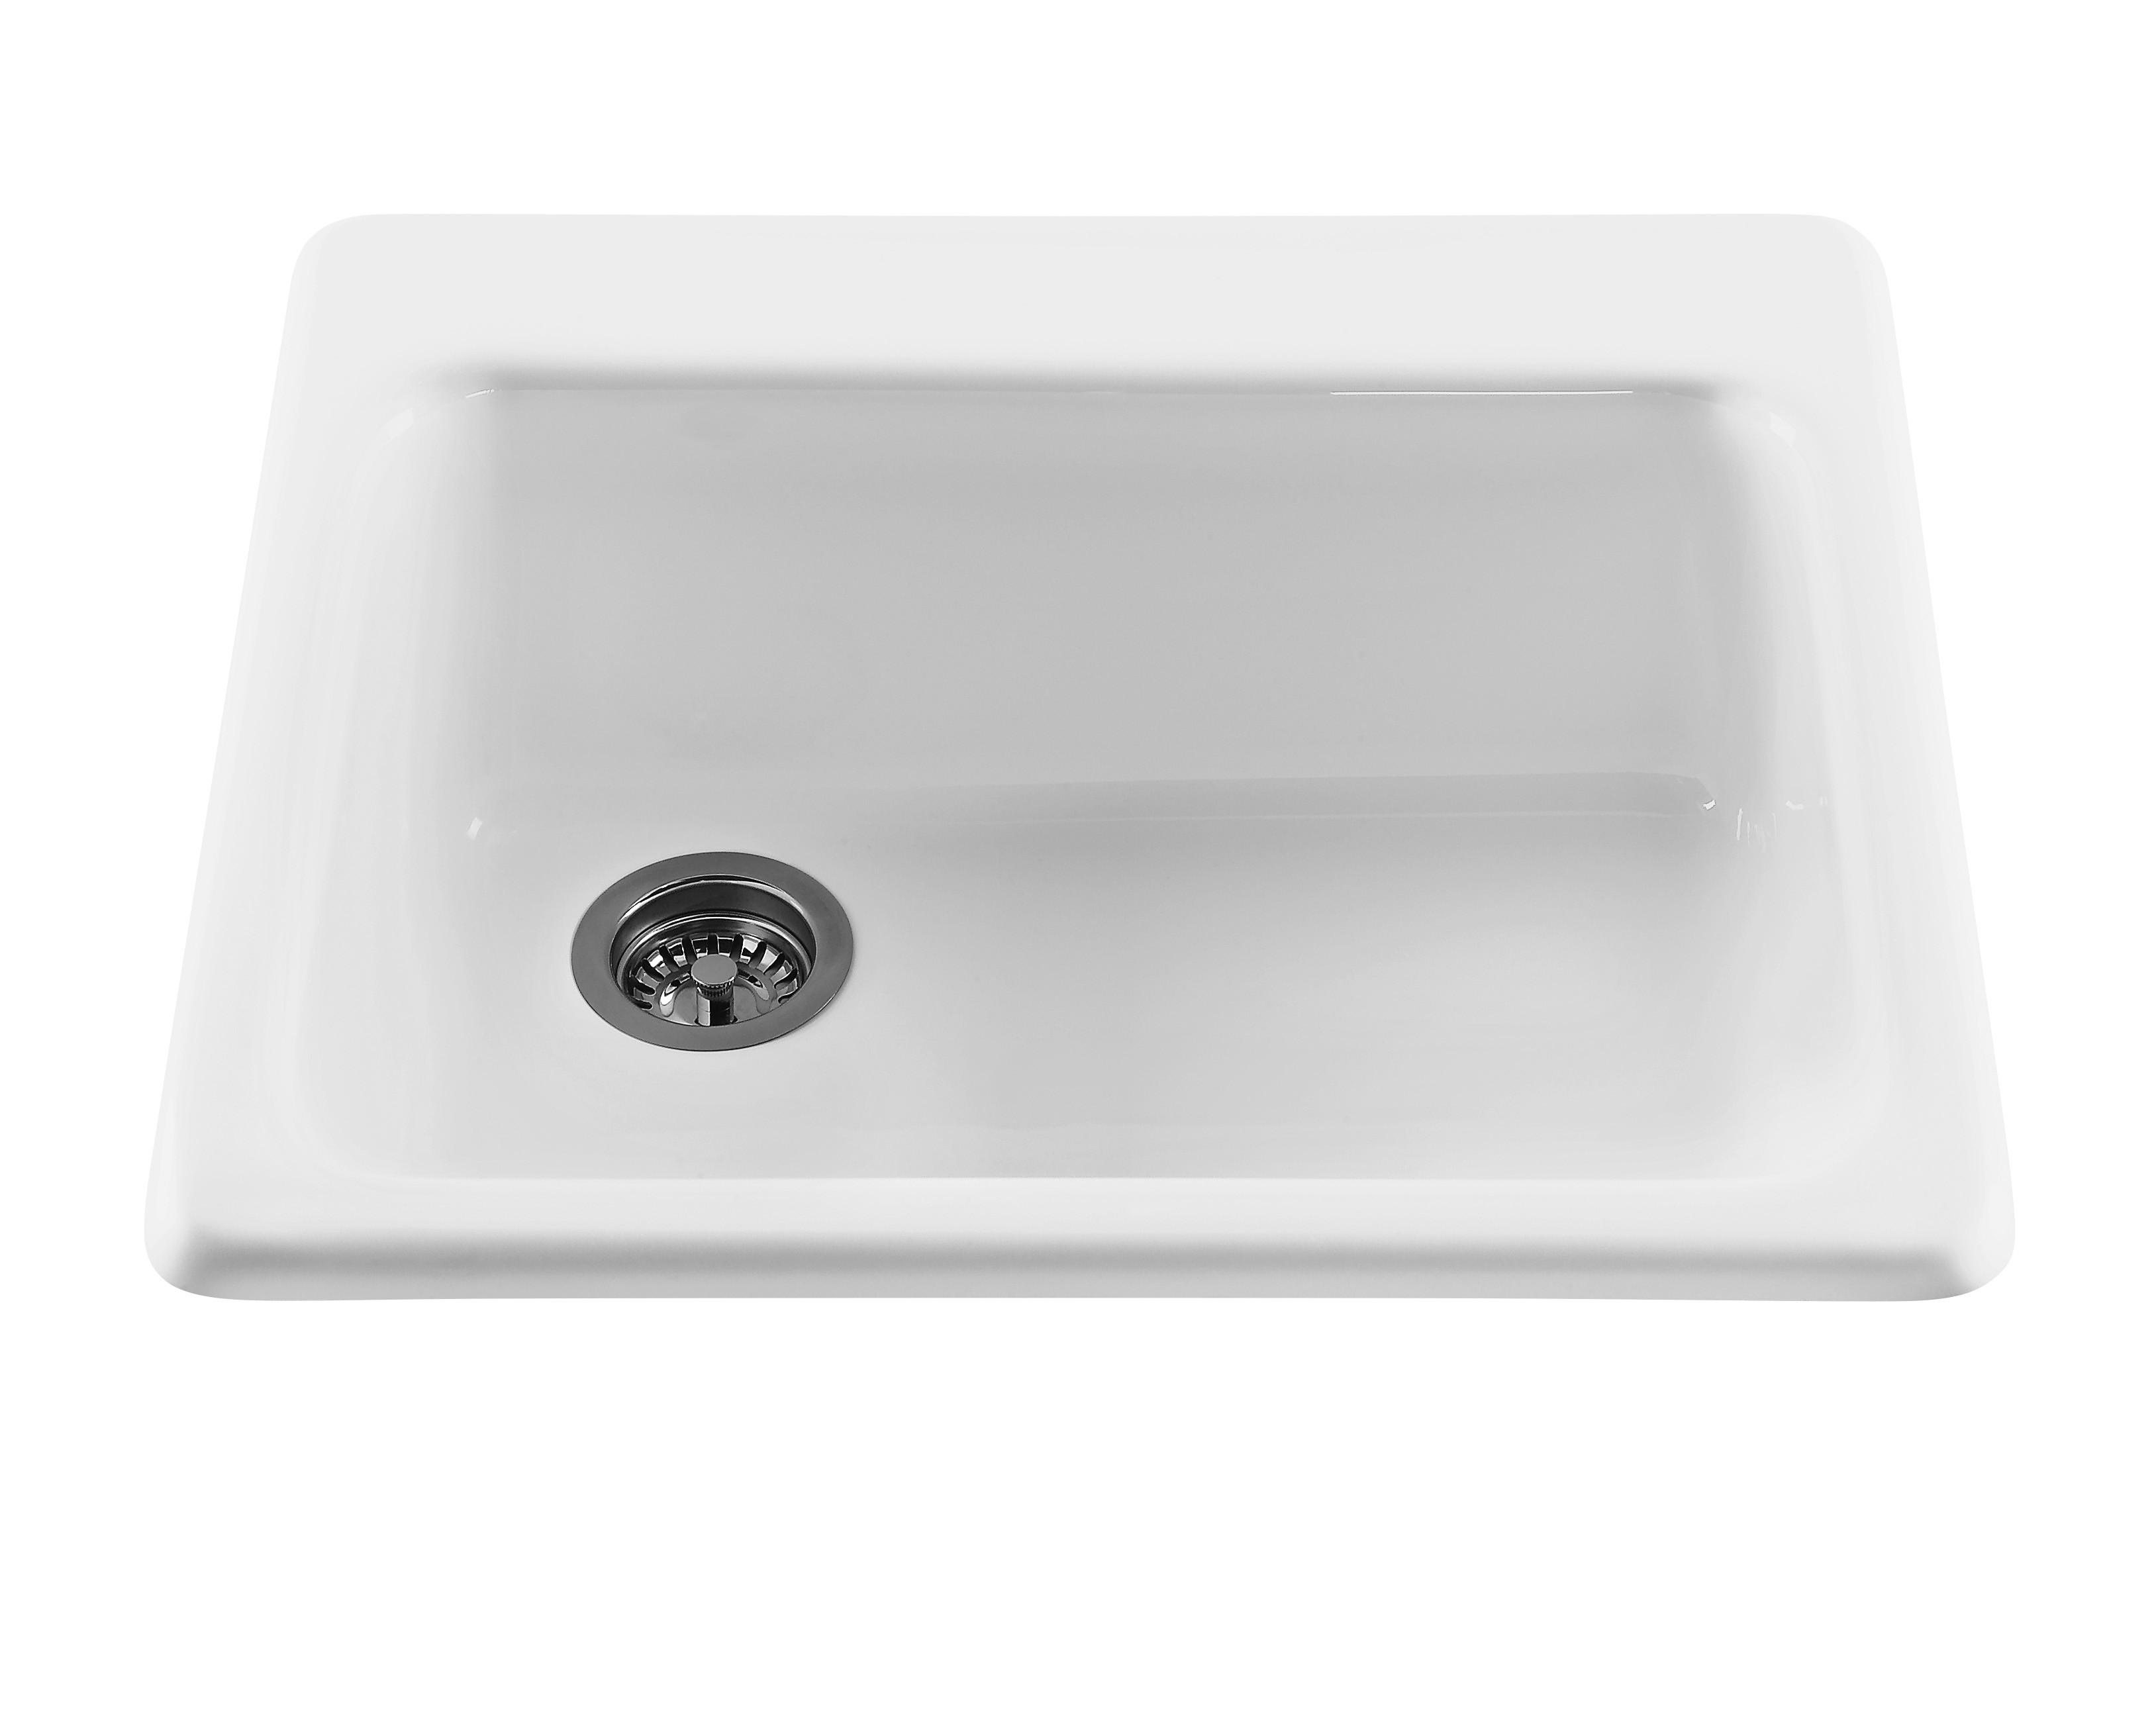 RKS40GRP1 Simplicity's Rectangular Kitchen Sink In Black